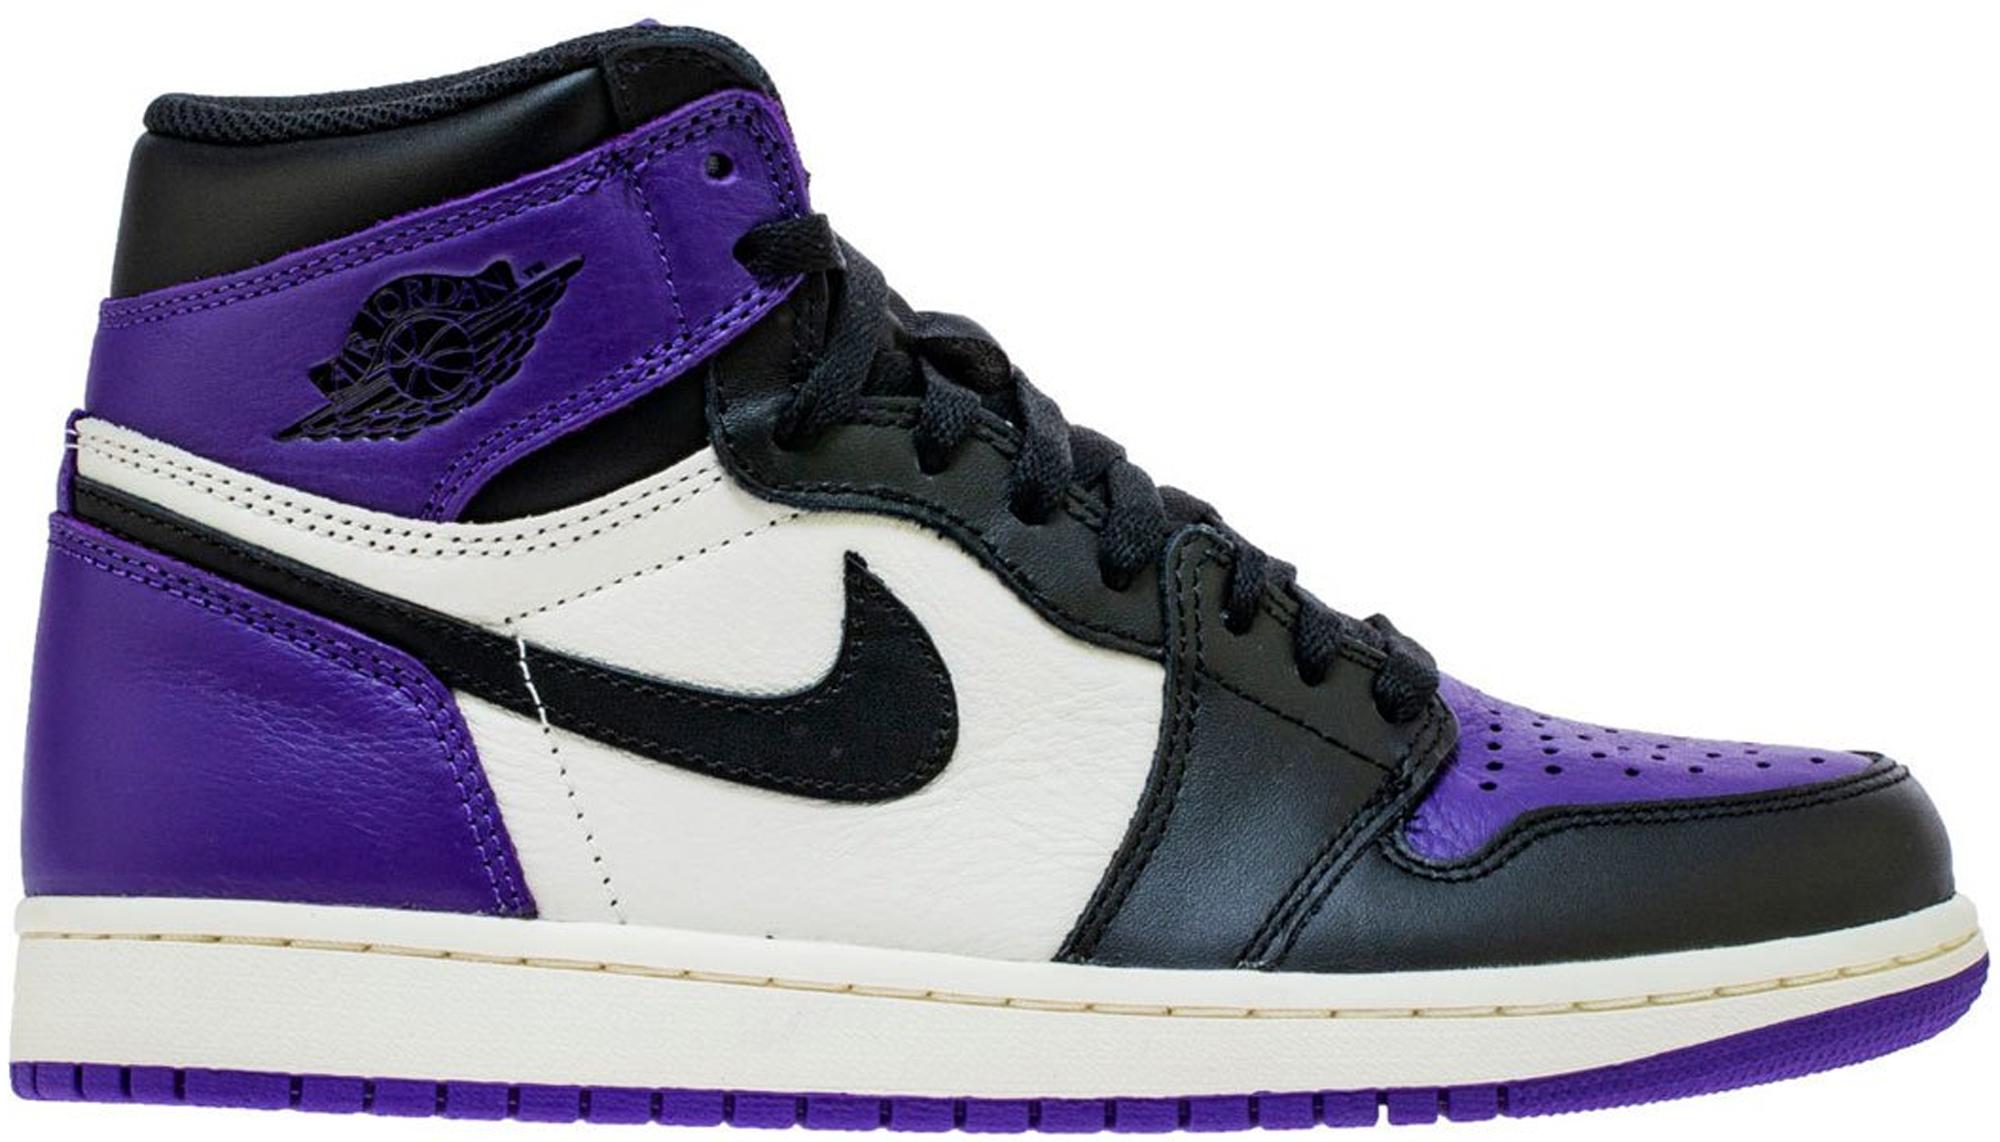 Air Jordan 1 High Court Purple